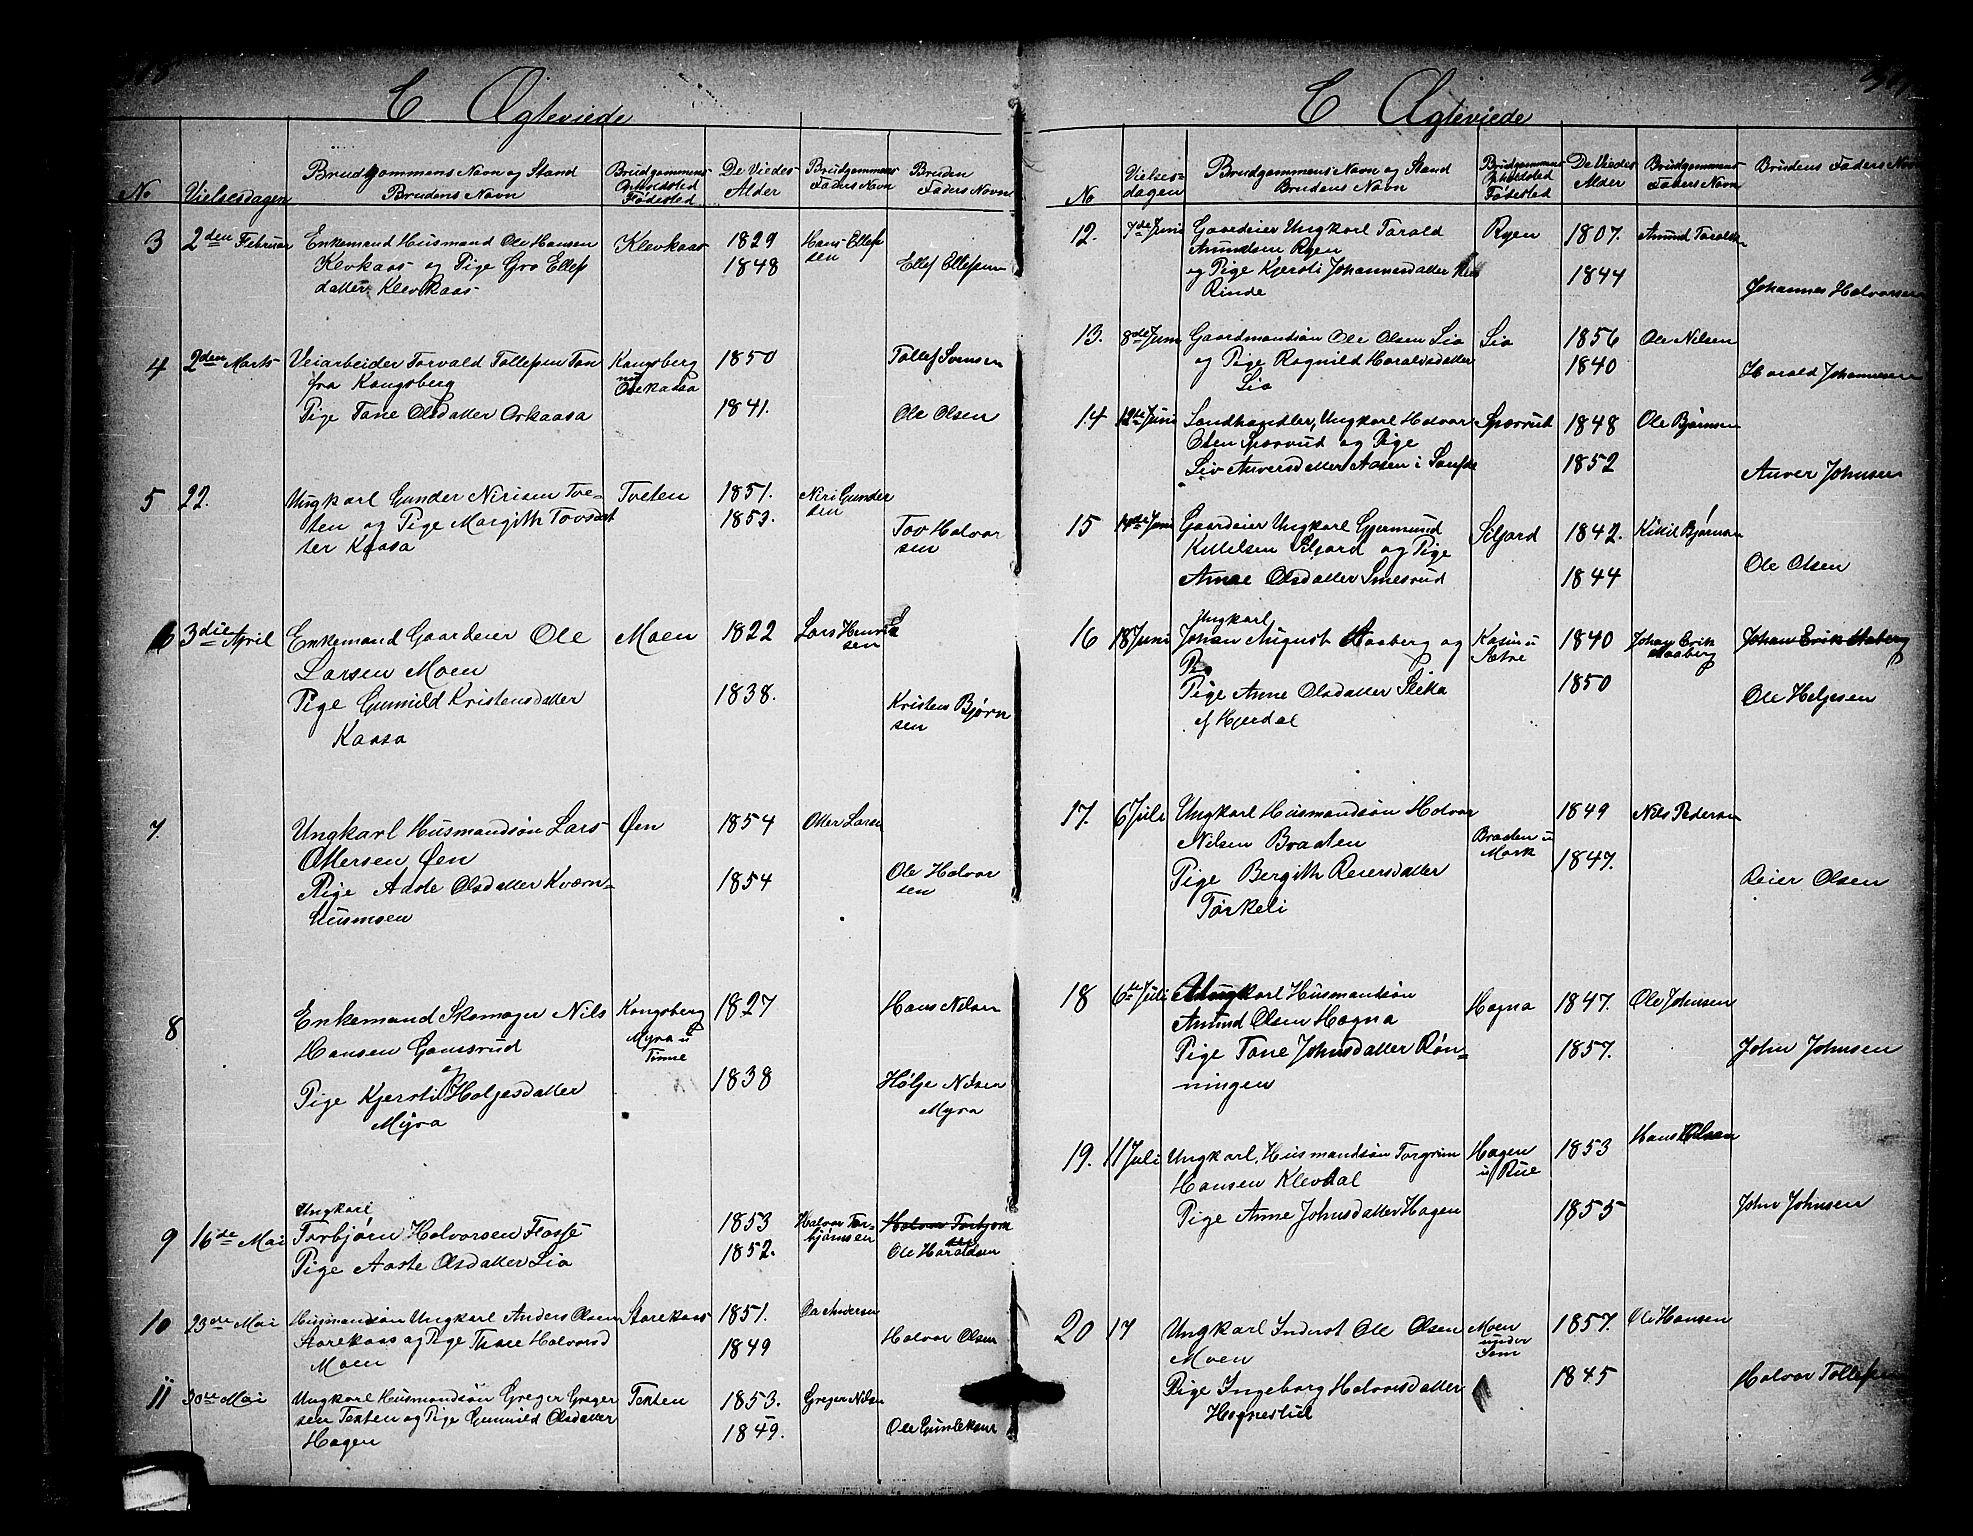 SAKO, Heddal kirkebøker, G/Ga/L0001: Klokkerbok nr. I 1, 1866-1878, s. 318-319